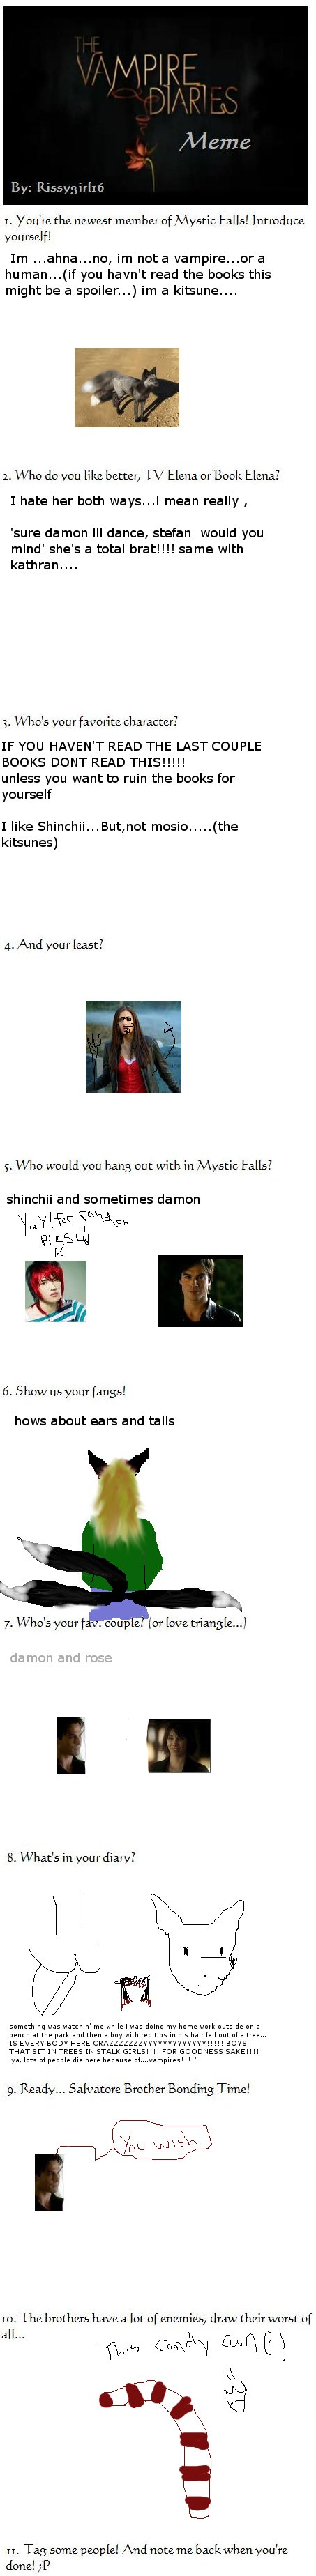 Vampire Diaries Meme By Rissygirl16 On Deviantart